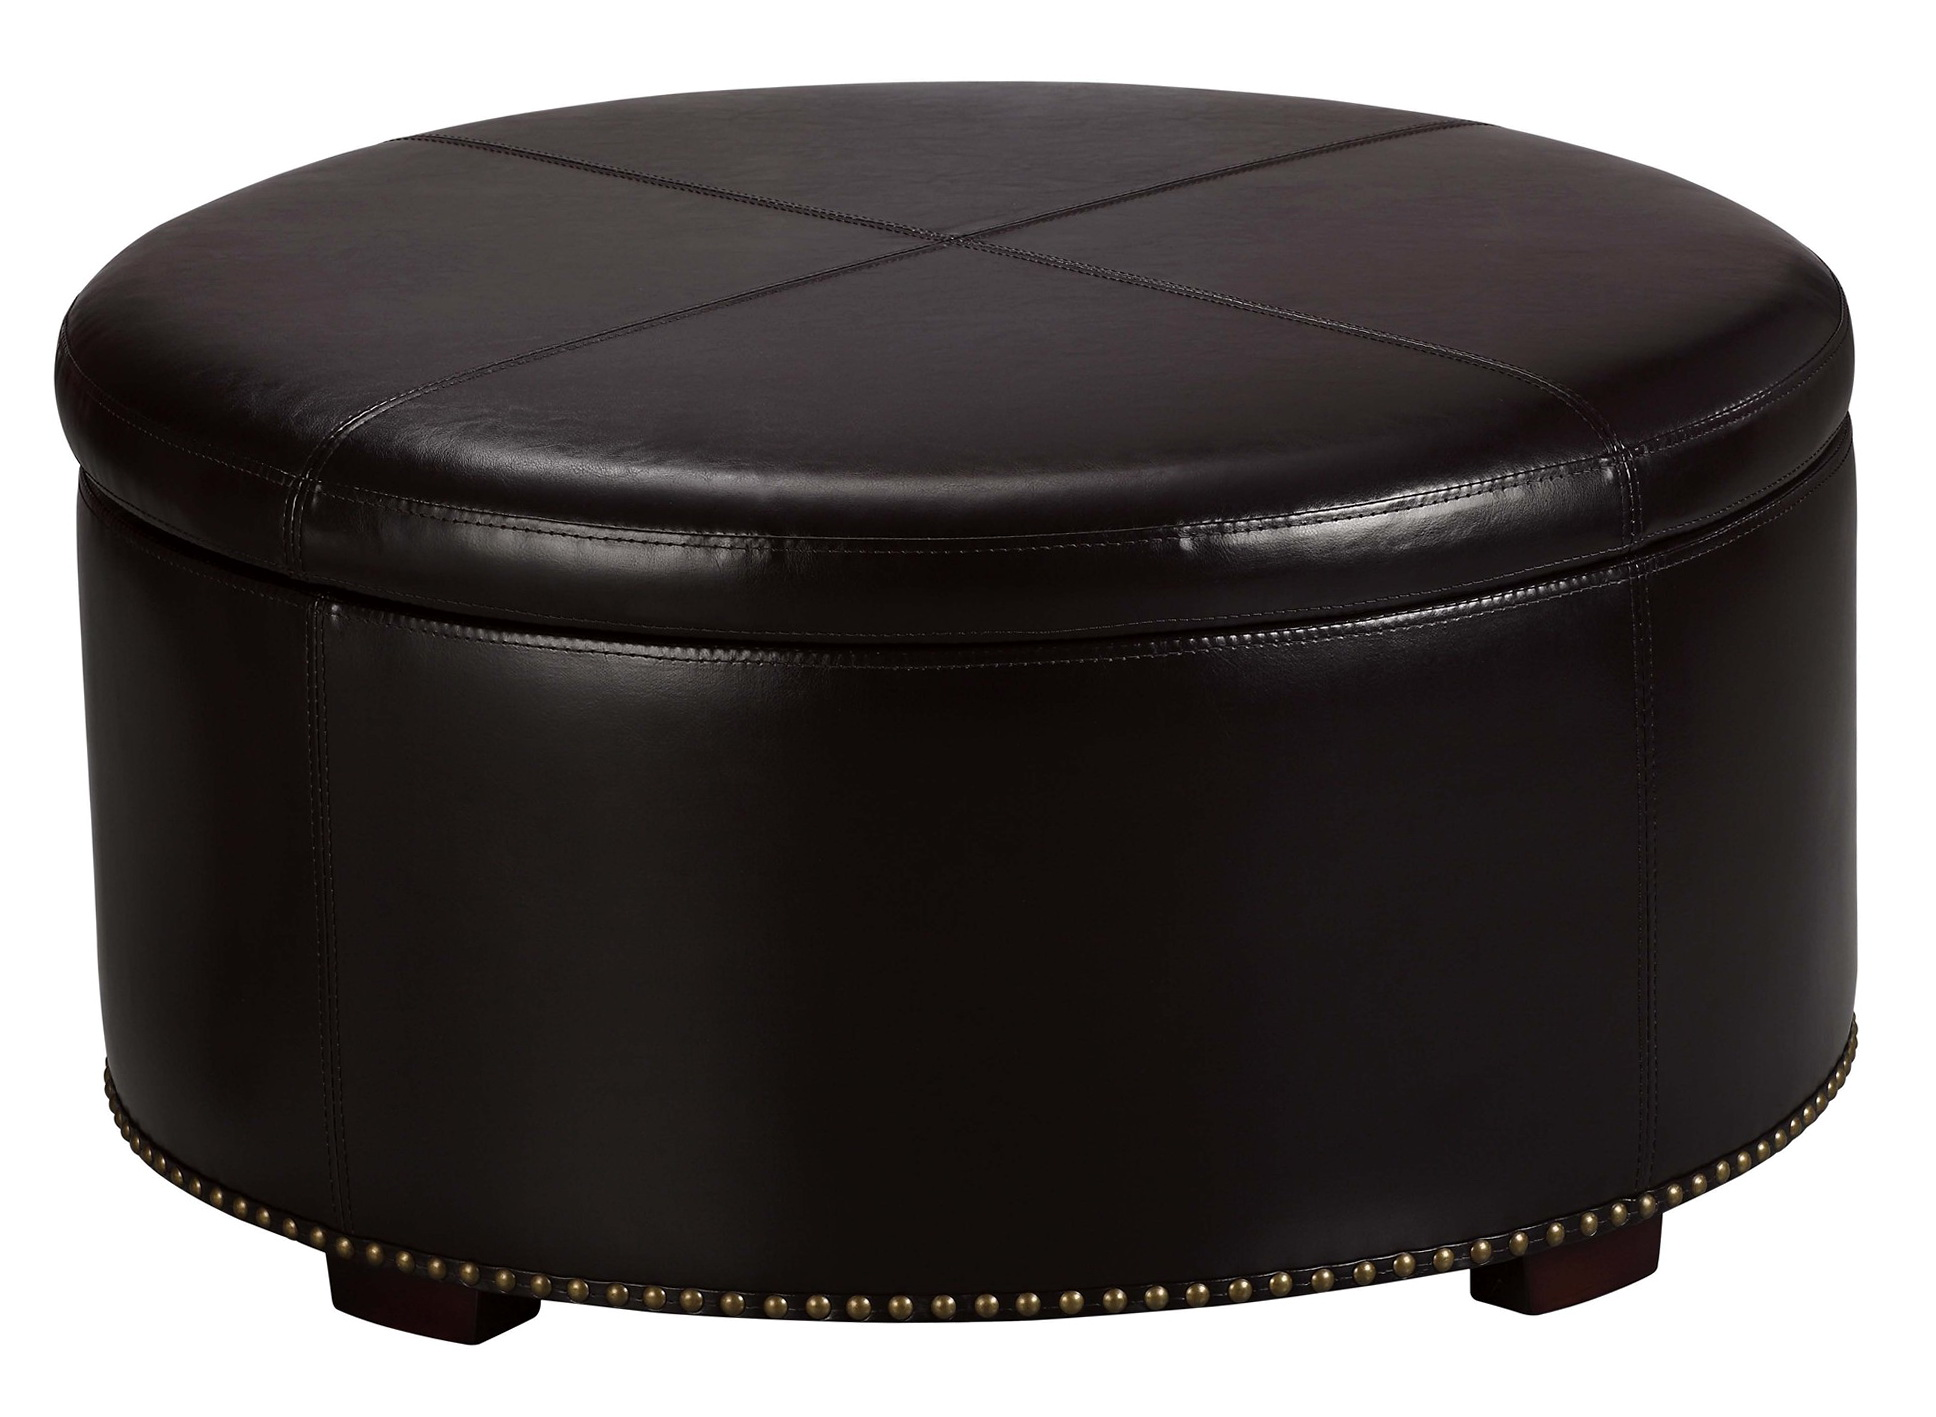 Round Storage Ottoman With Tray